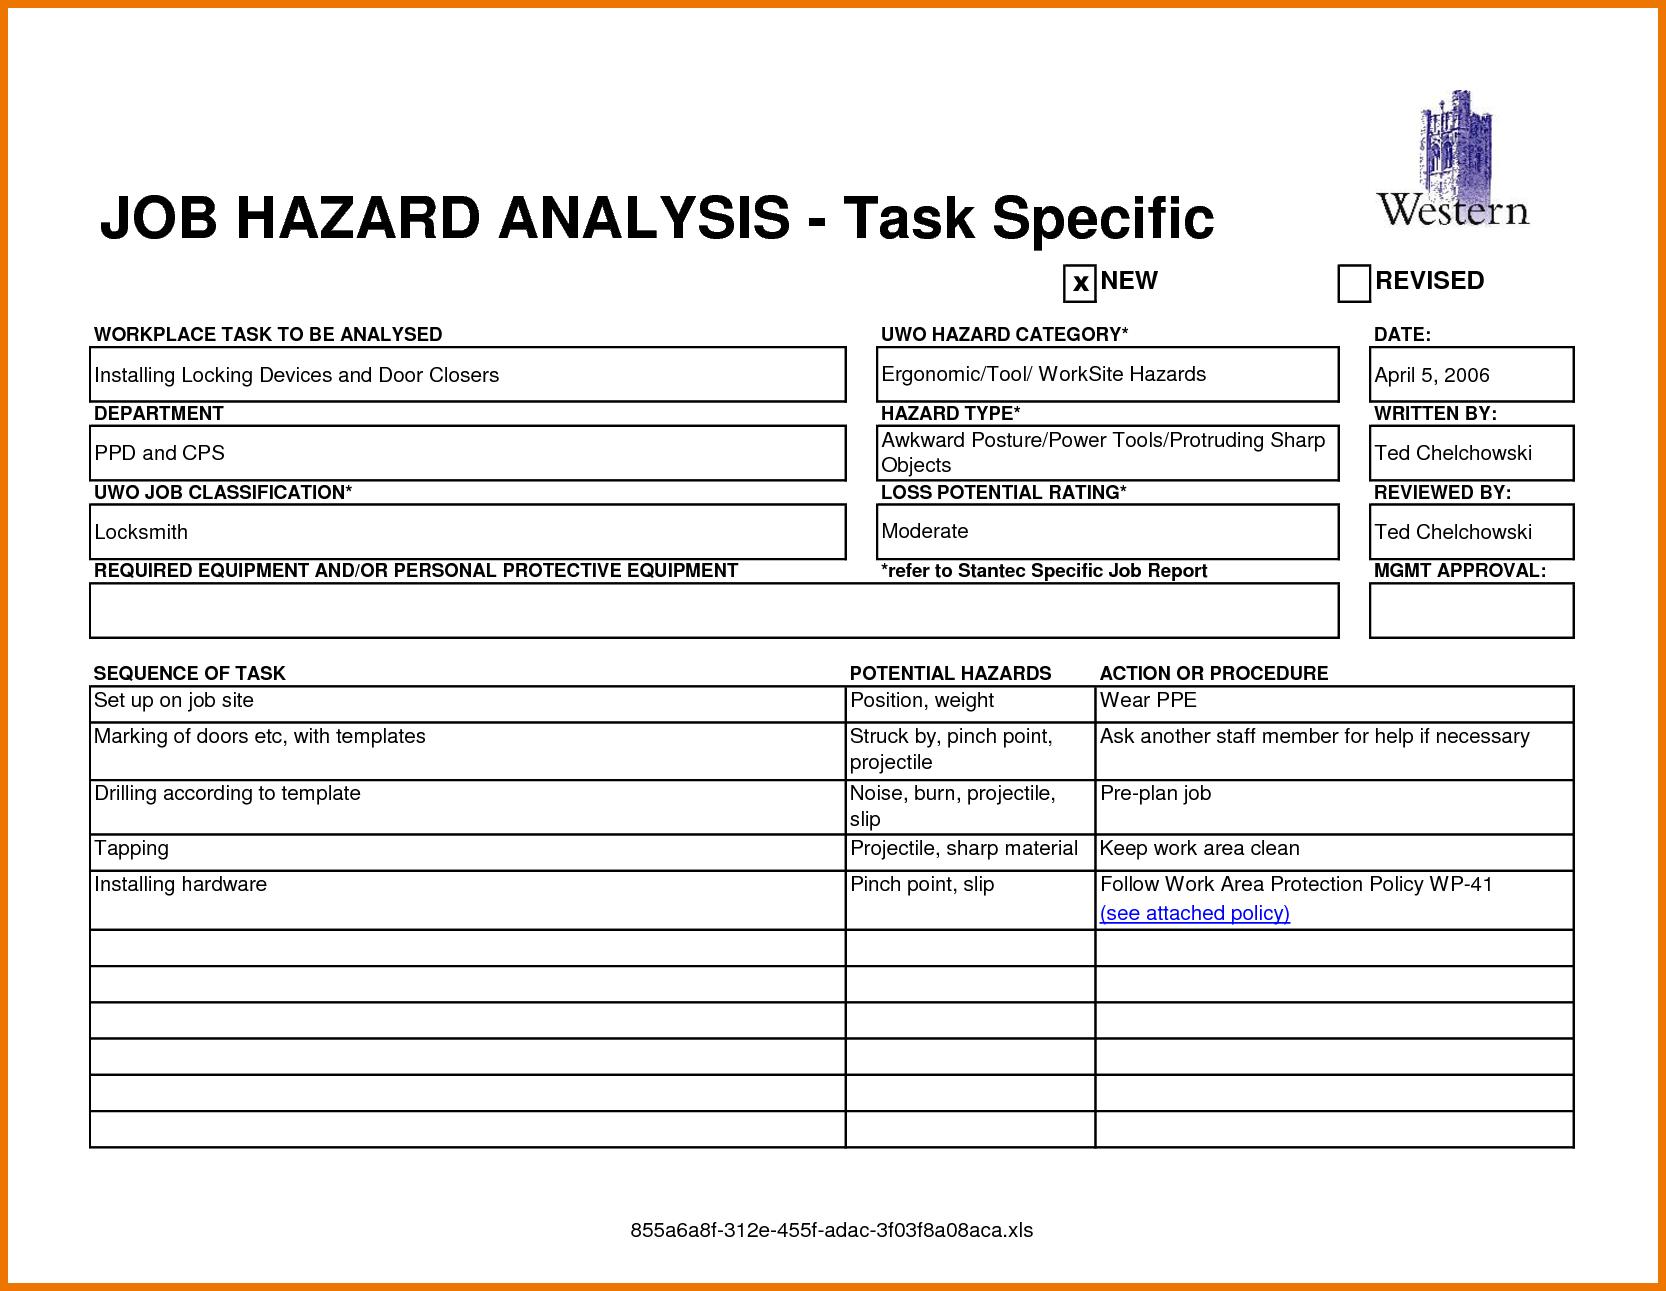 13 Job Safety Analysis Examples  Pdf Word Pages  Examples With Regard To Job Hazard Analysis Worksheet